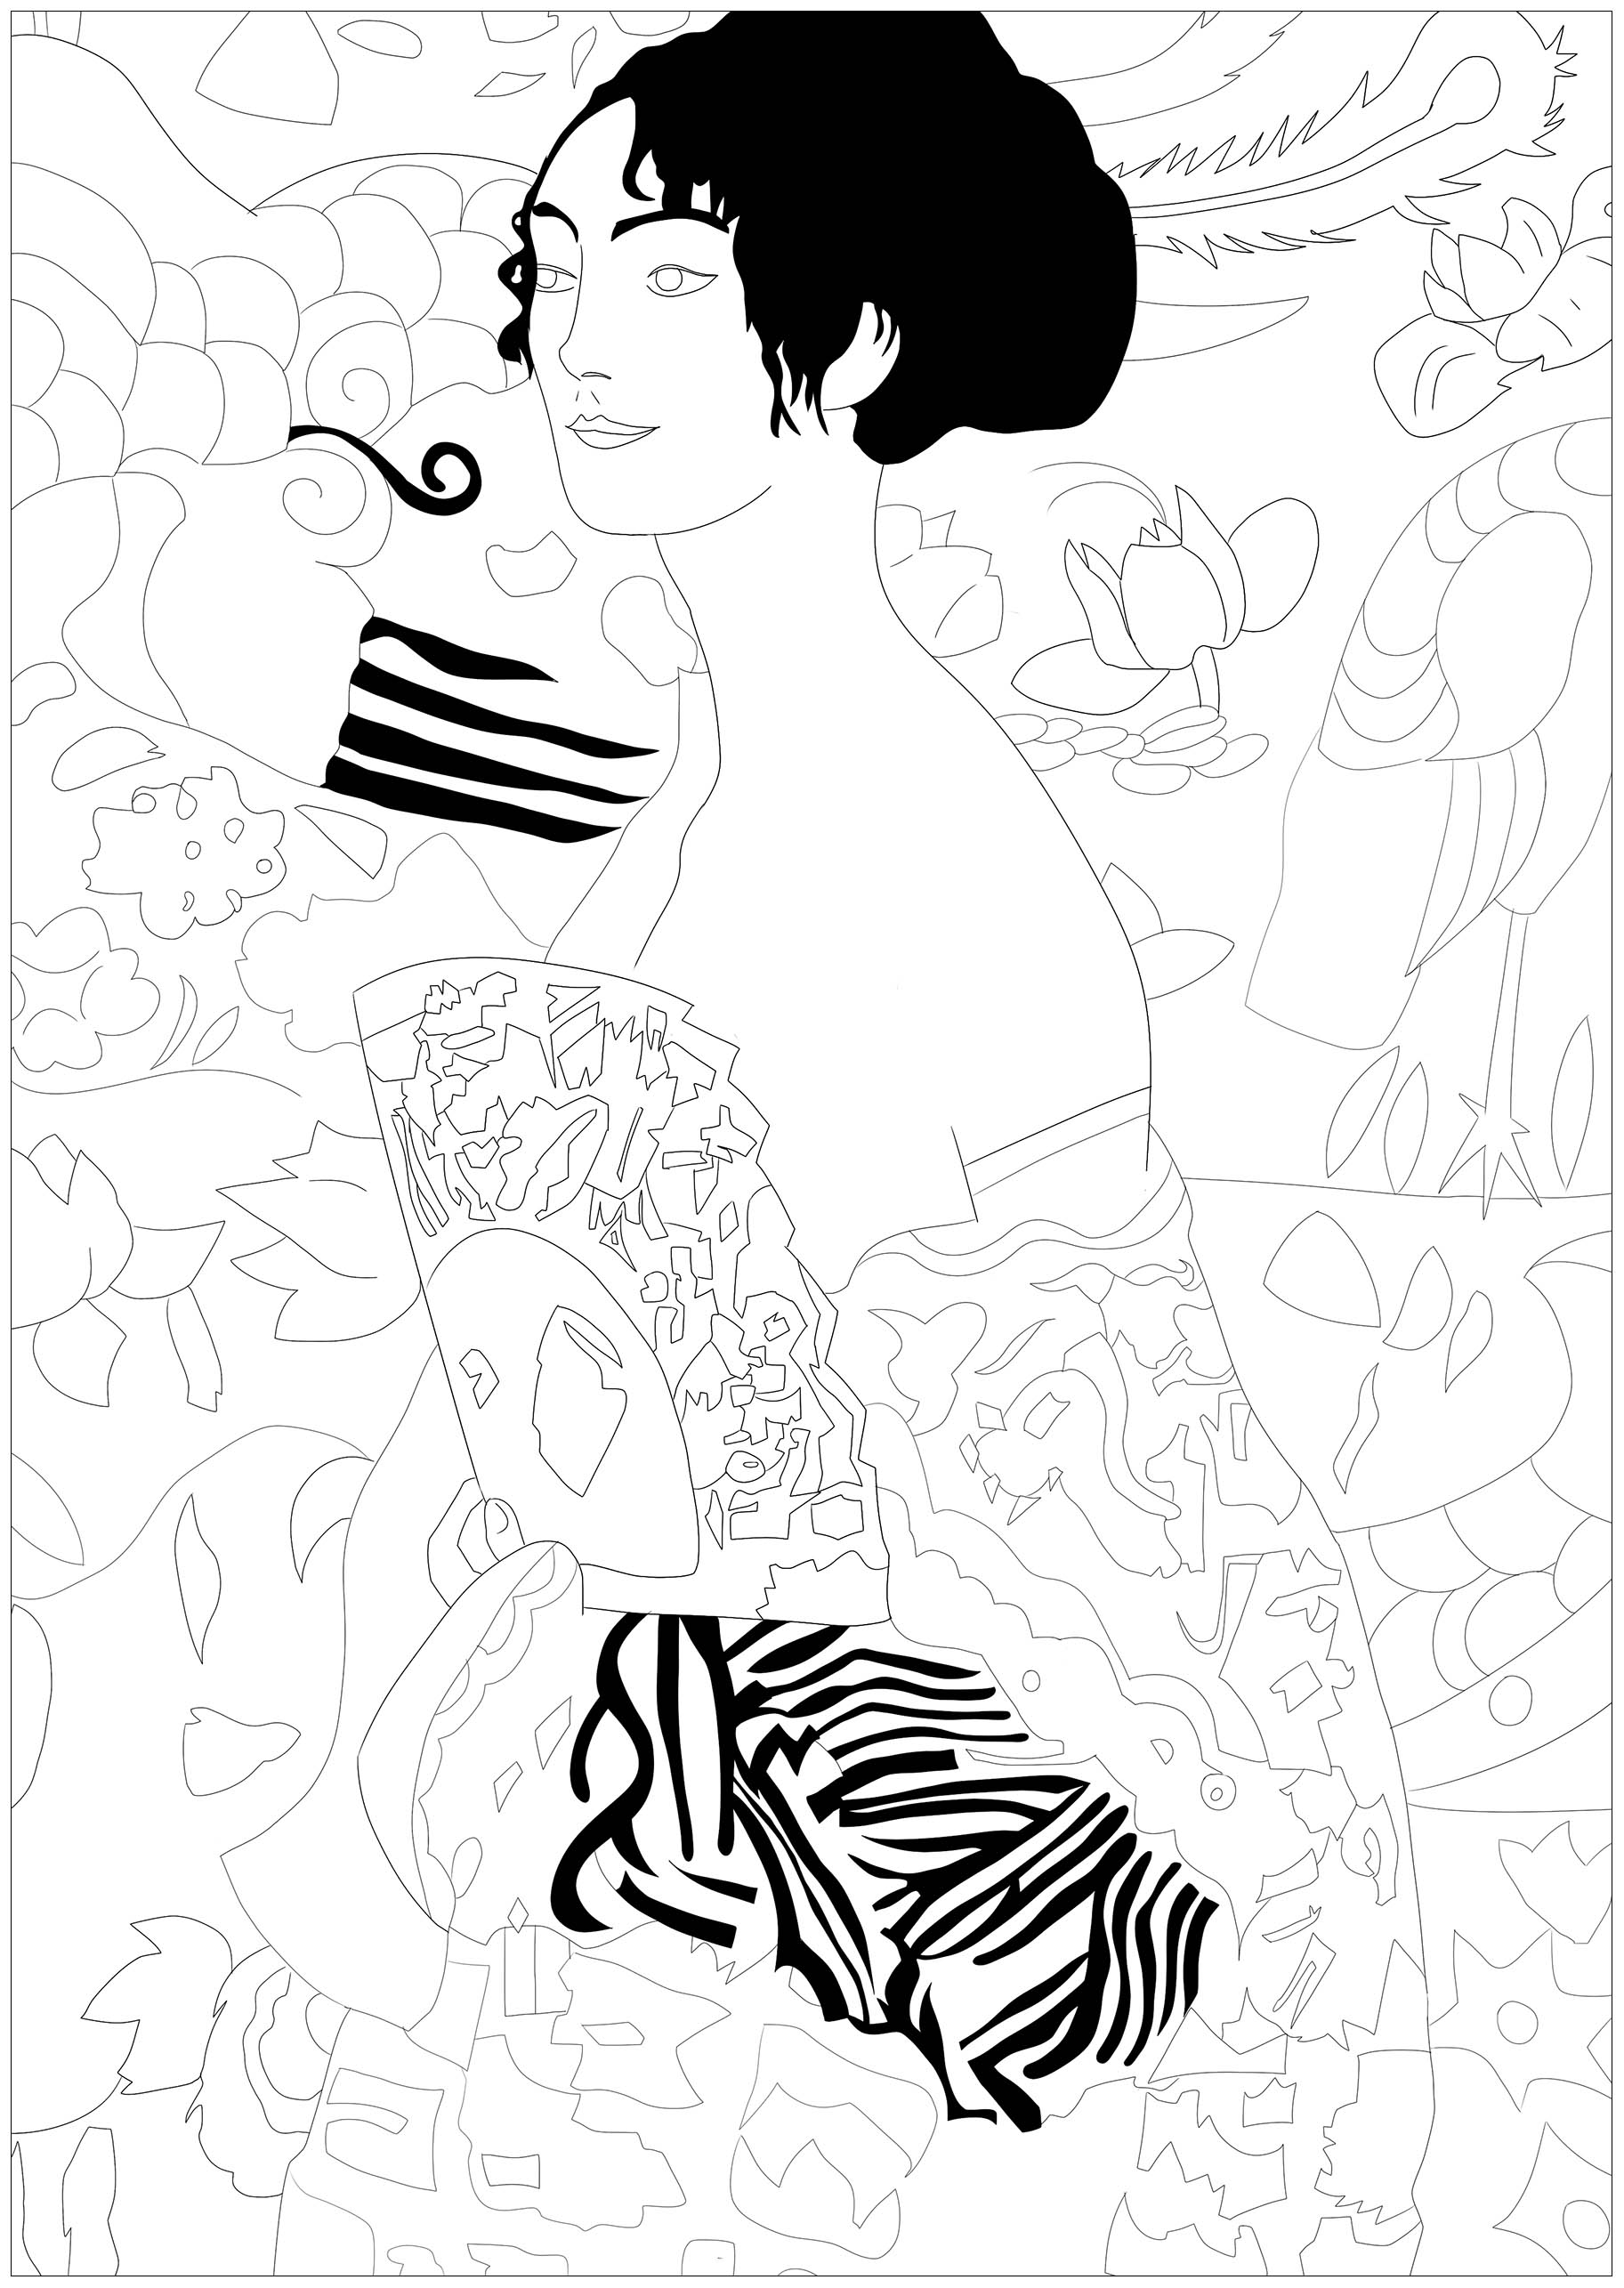 Disegni da colorare per adulti : Opera d arte - 90